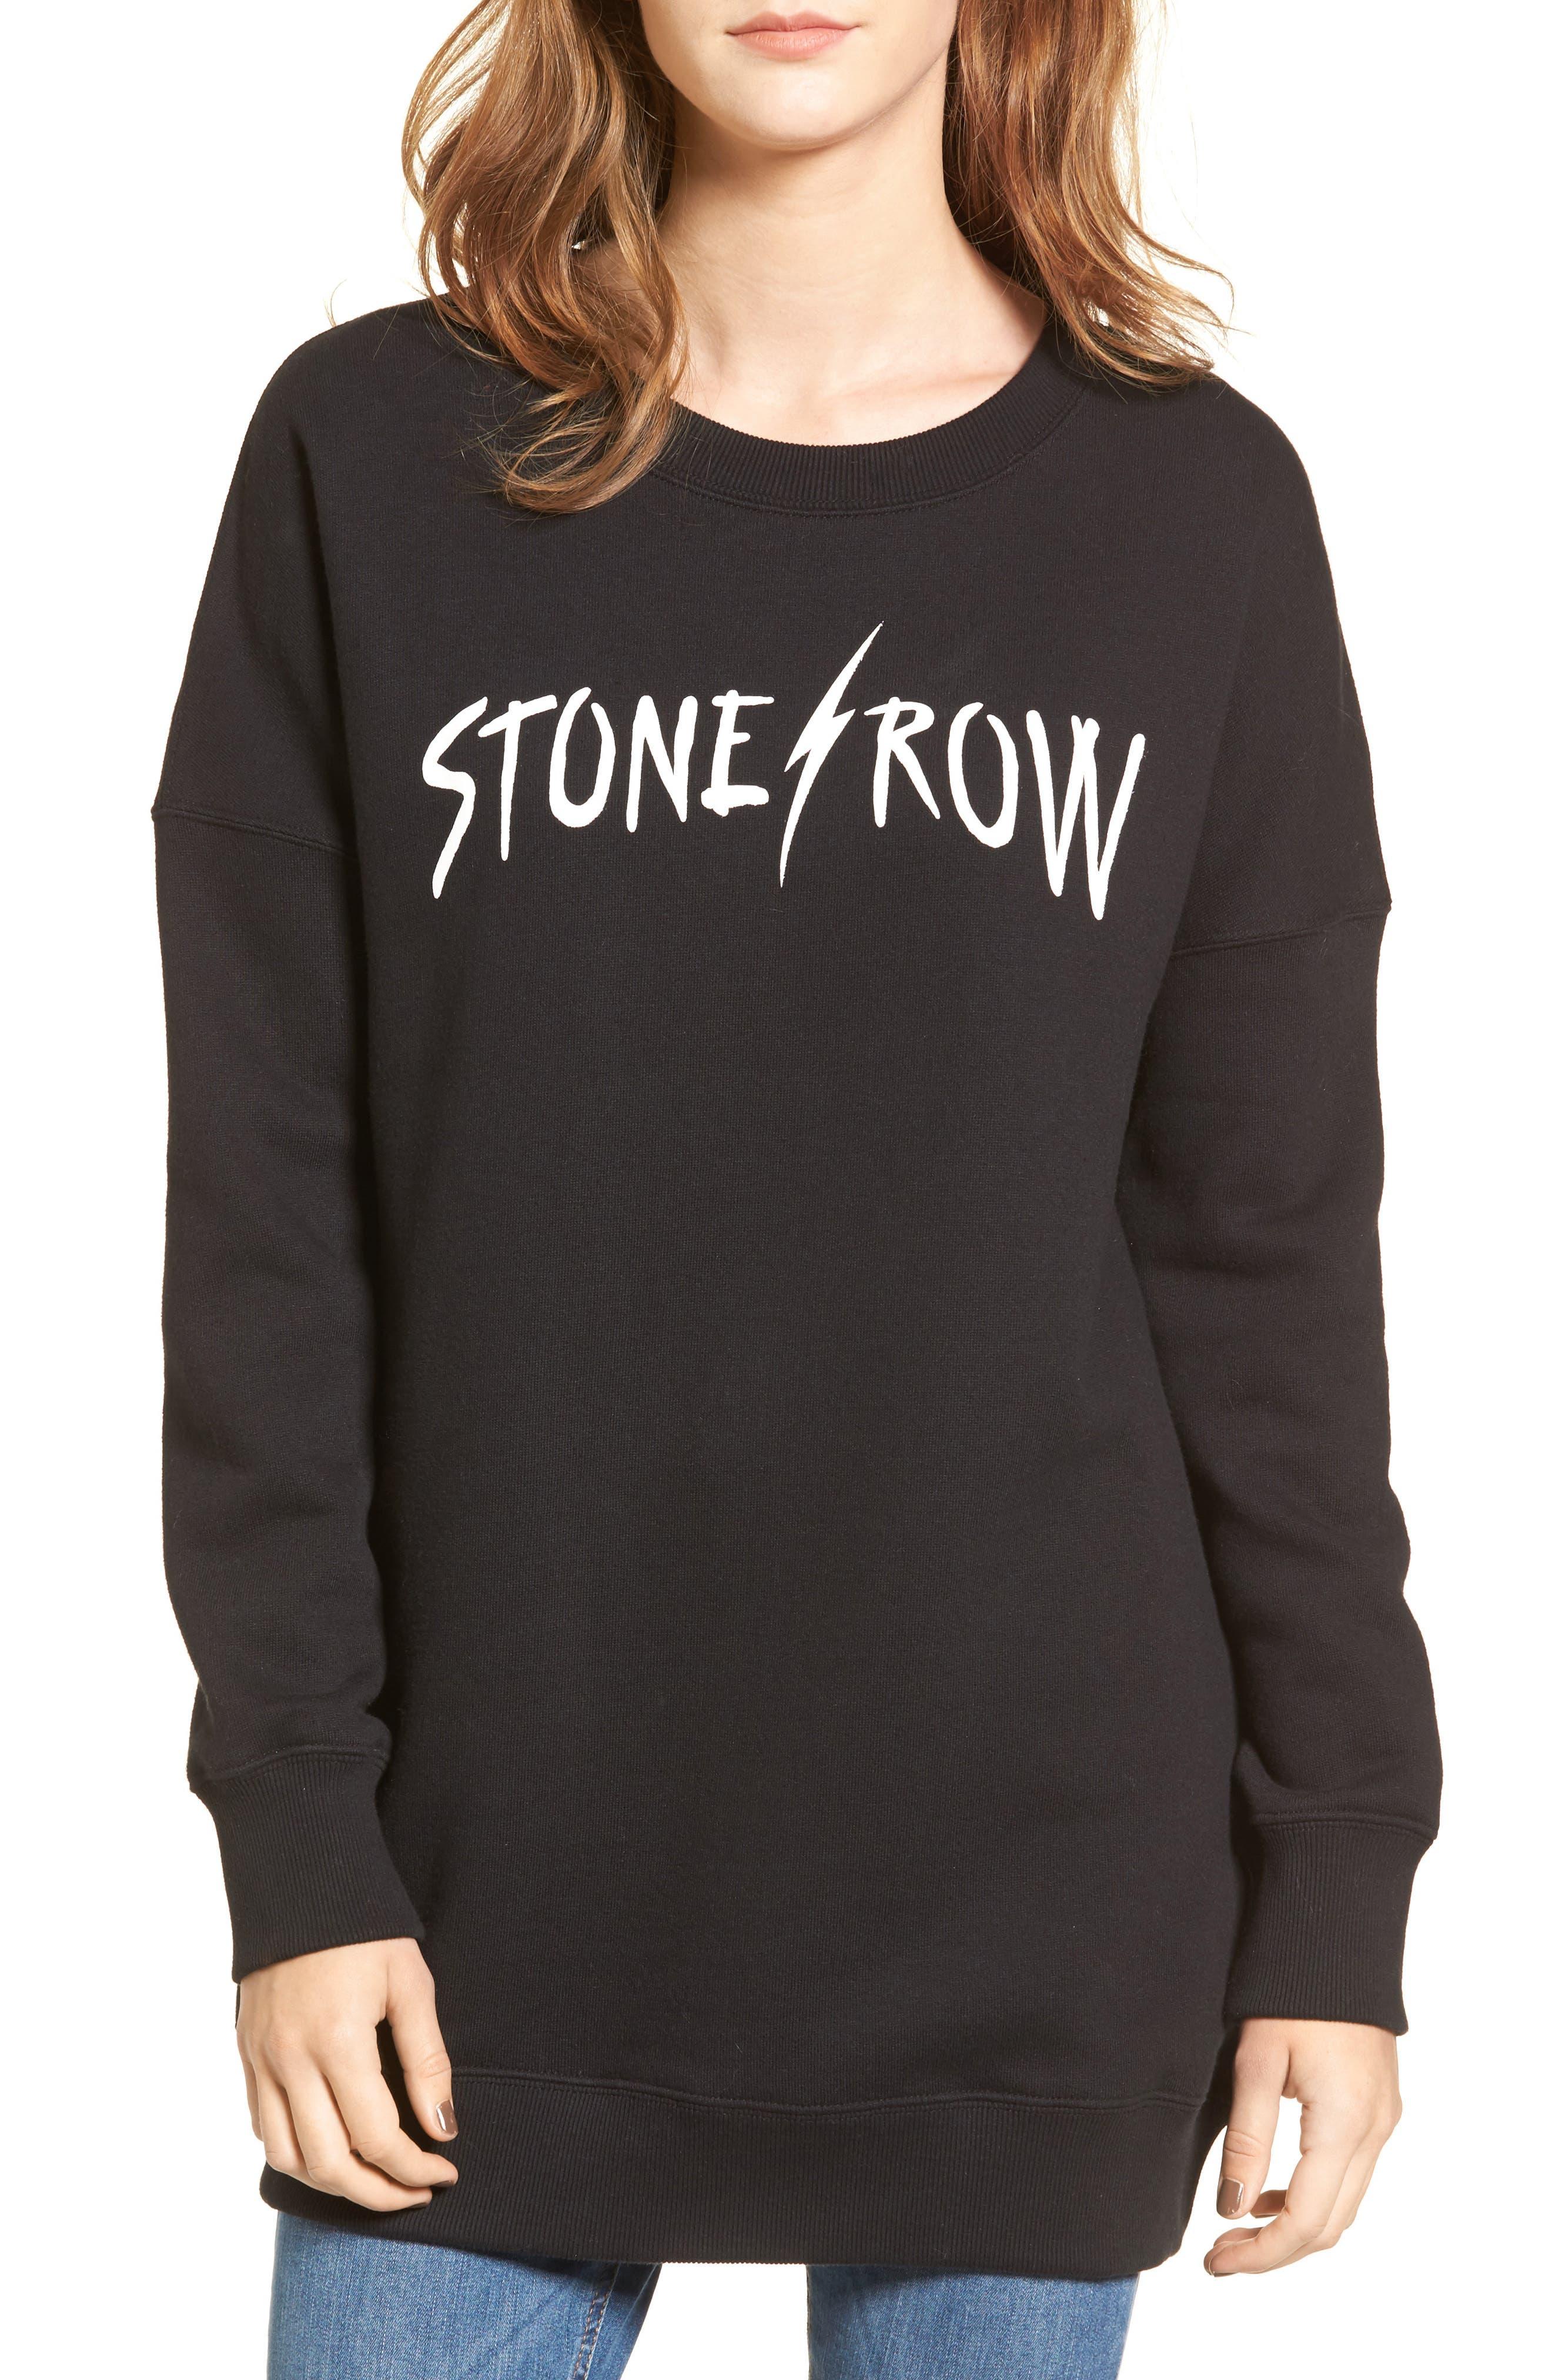 Me Too Sweatshirt,                         Main,                         color, Black